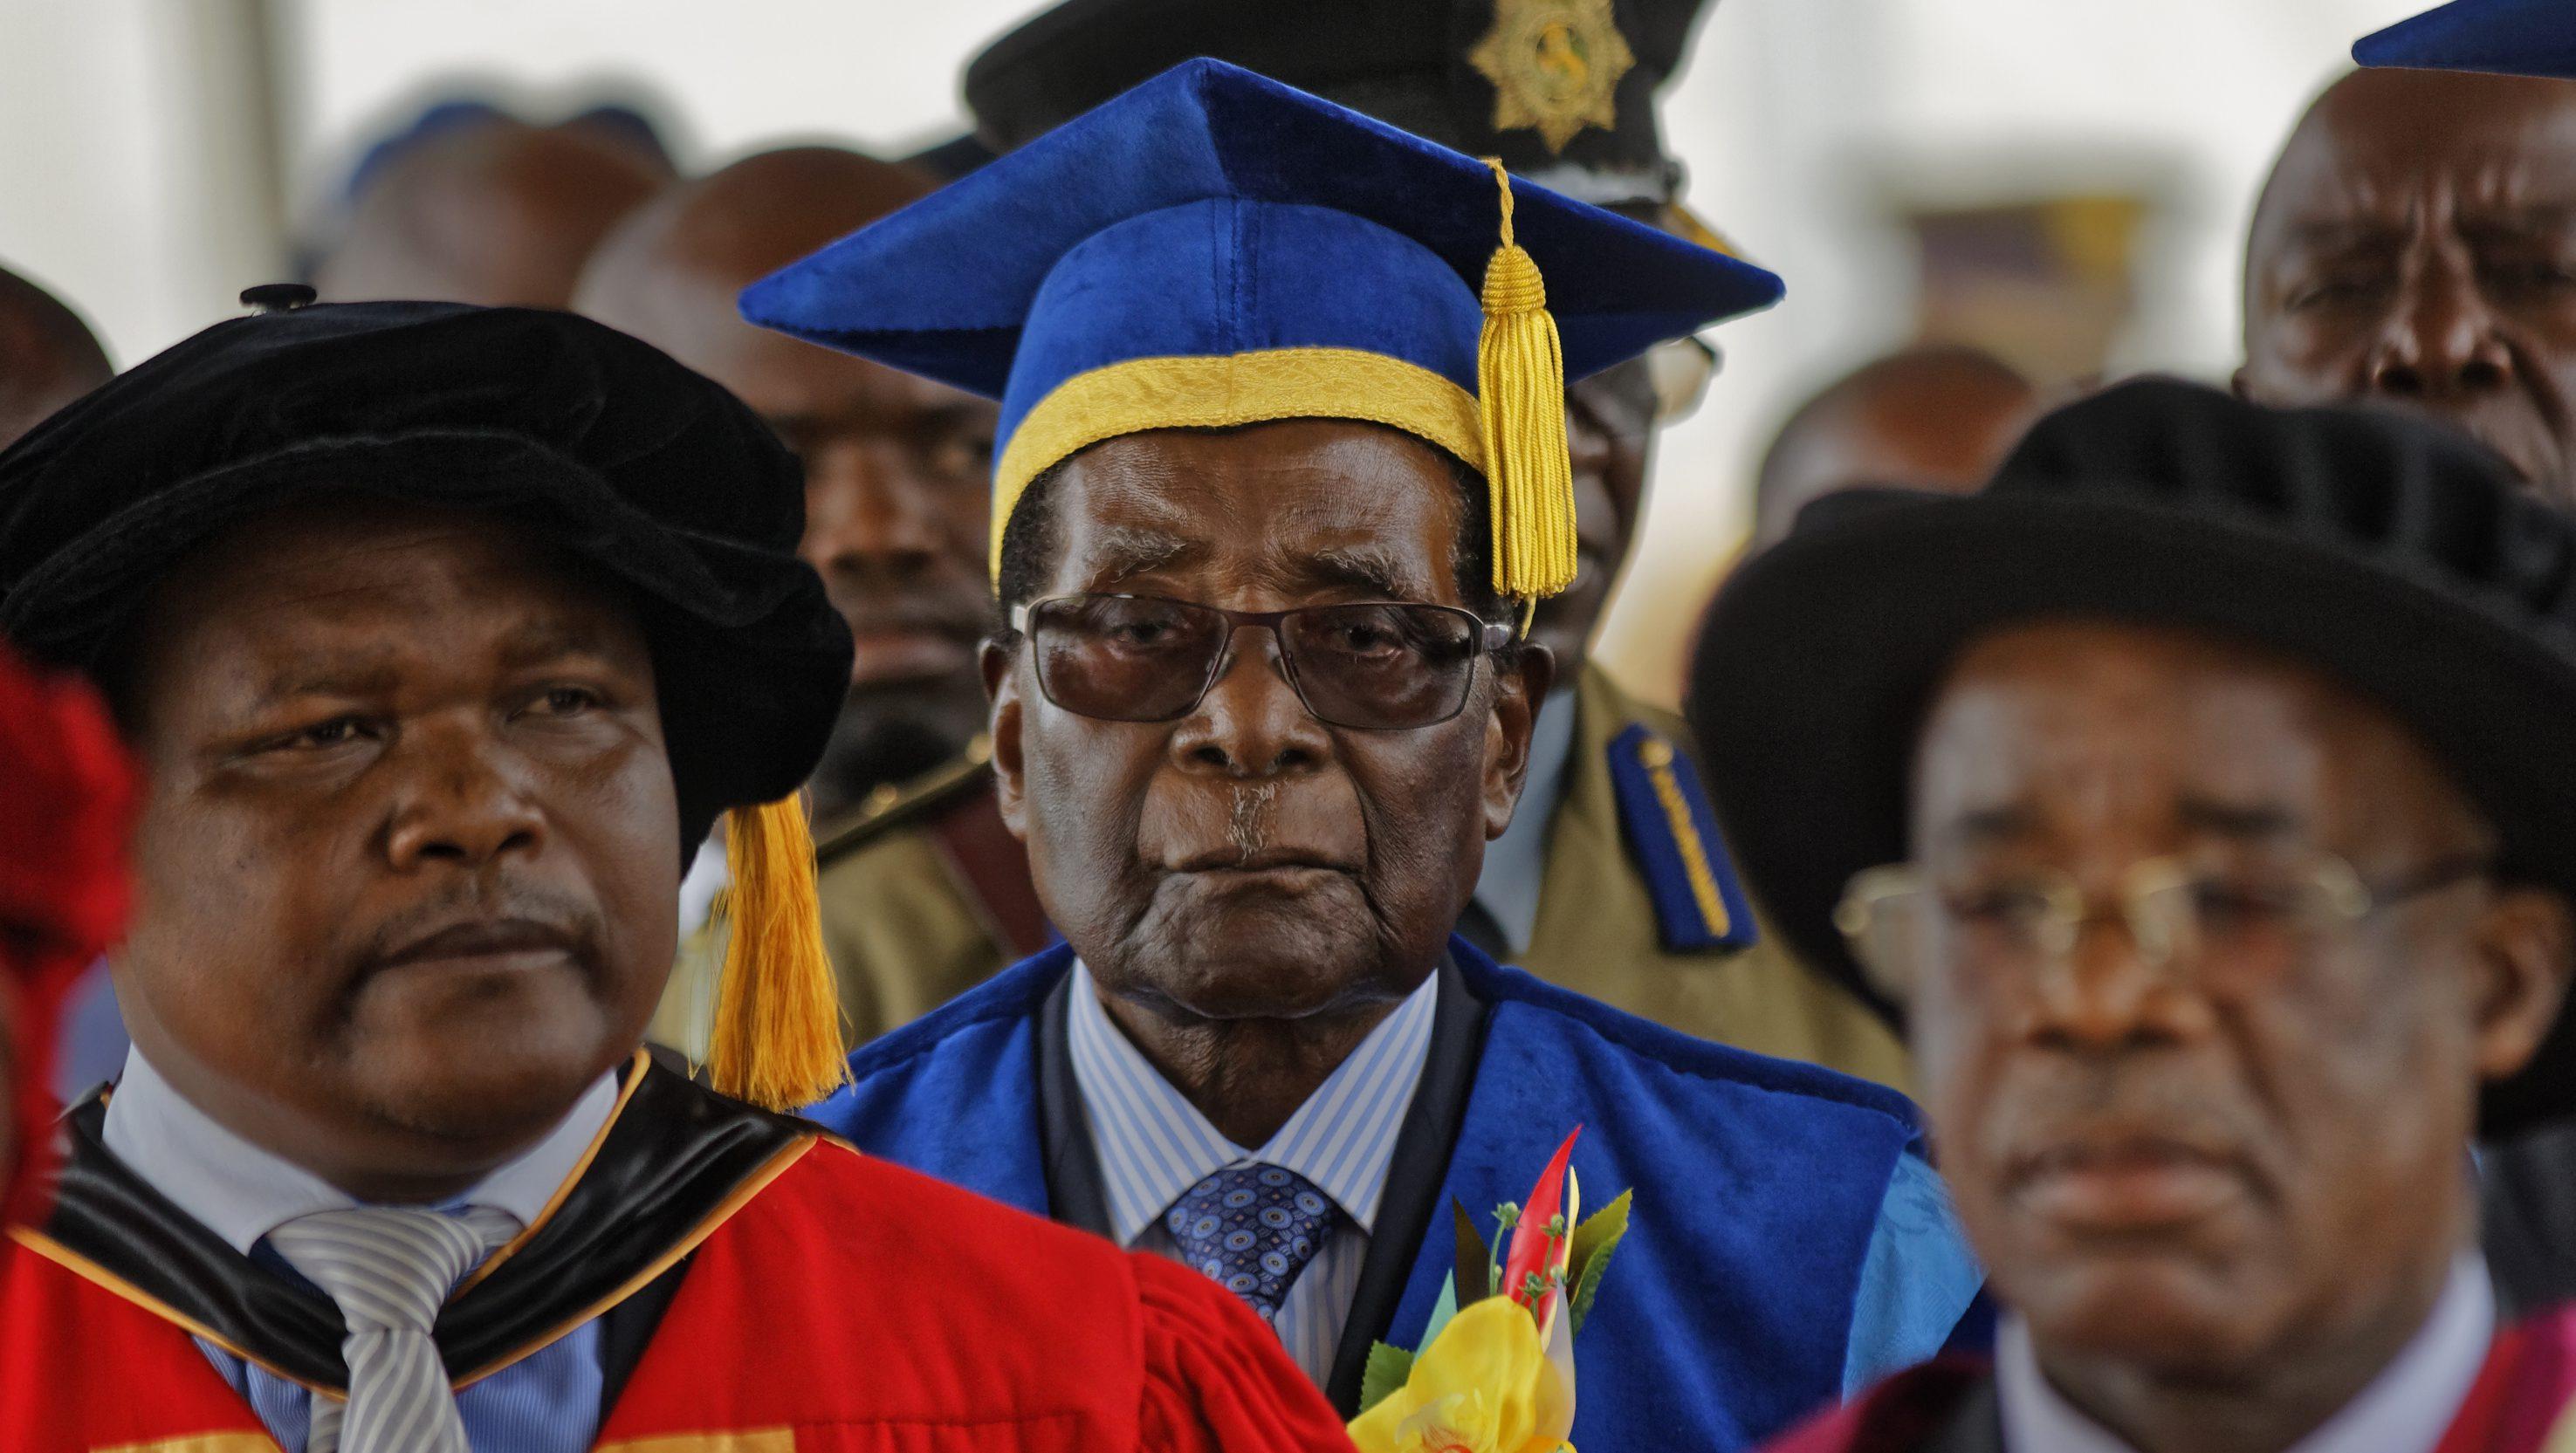 Zimbabwe's President Robert Mugabe, center, arrives to preside over a student graduation ceremony at Zimbabwe Open University on the outskirts of the capital, Harare, on Nov. 17, 2017.